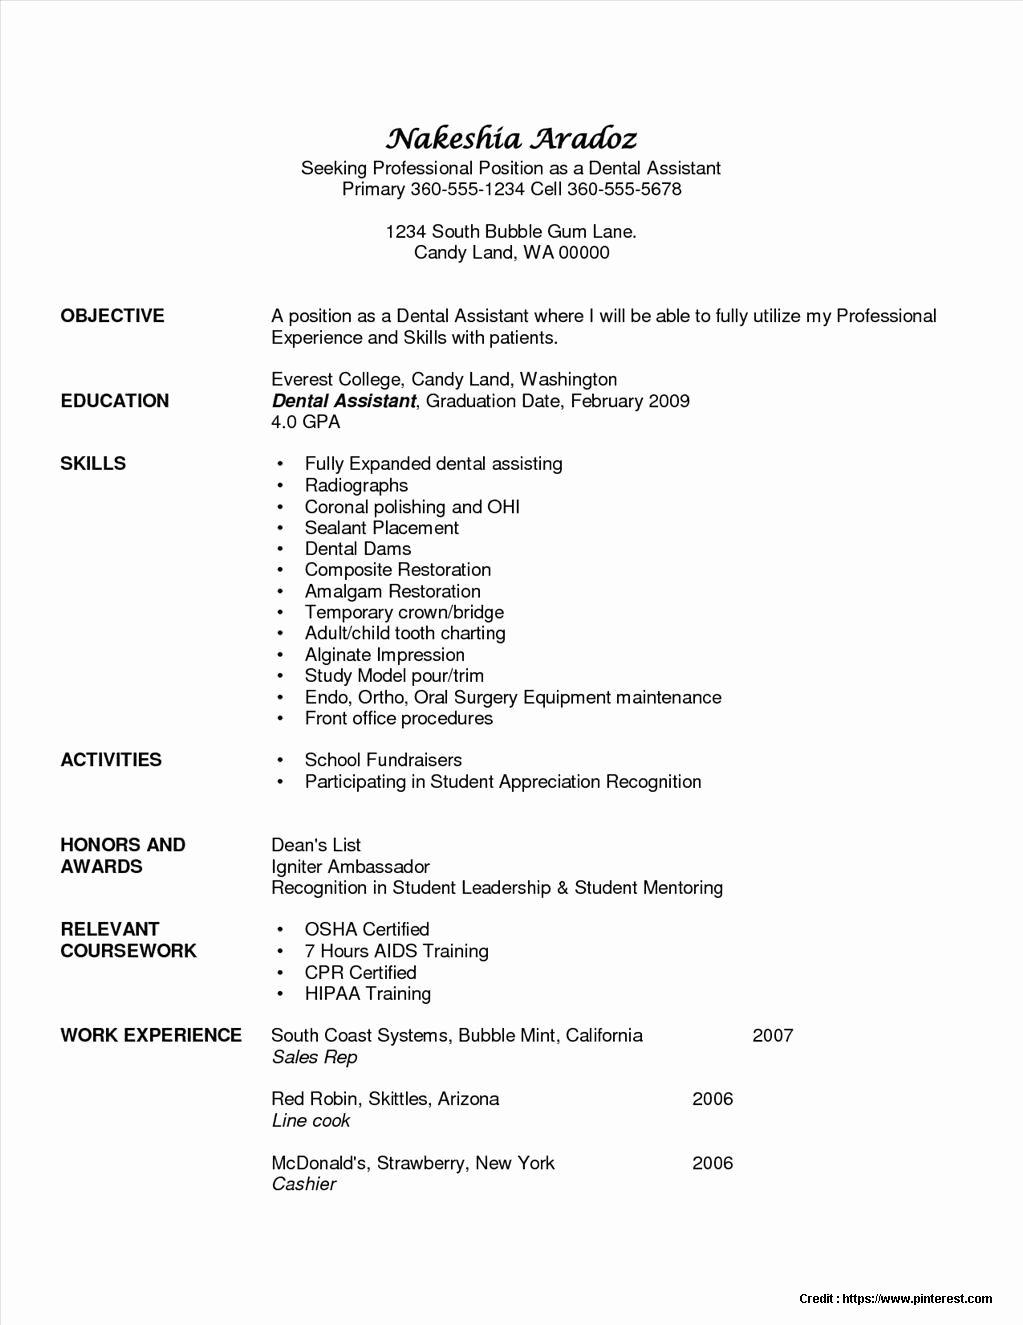 Sample Resume Dental assistant Objective Resume Resume